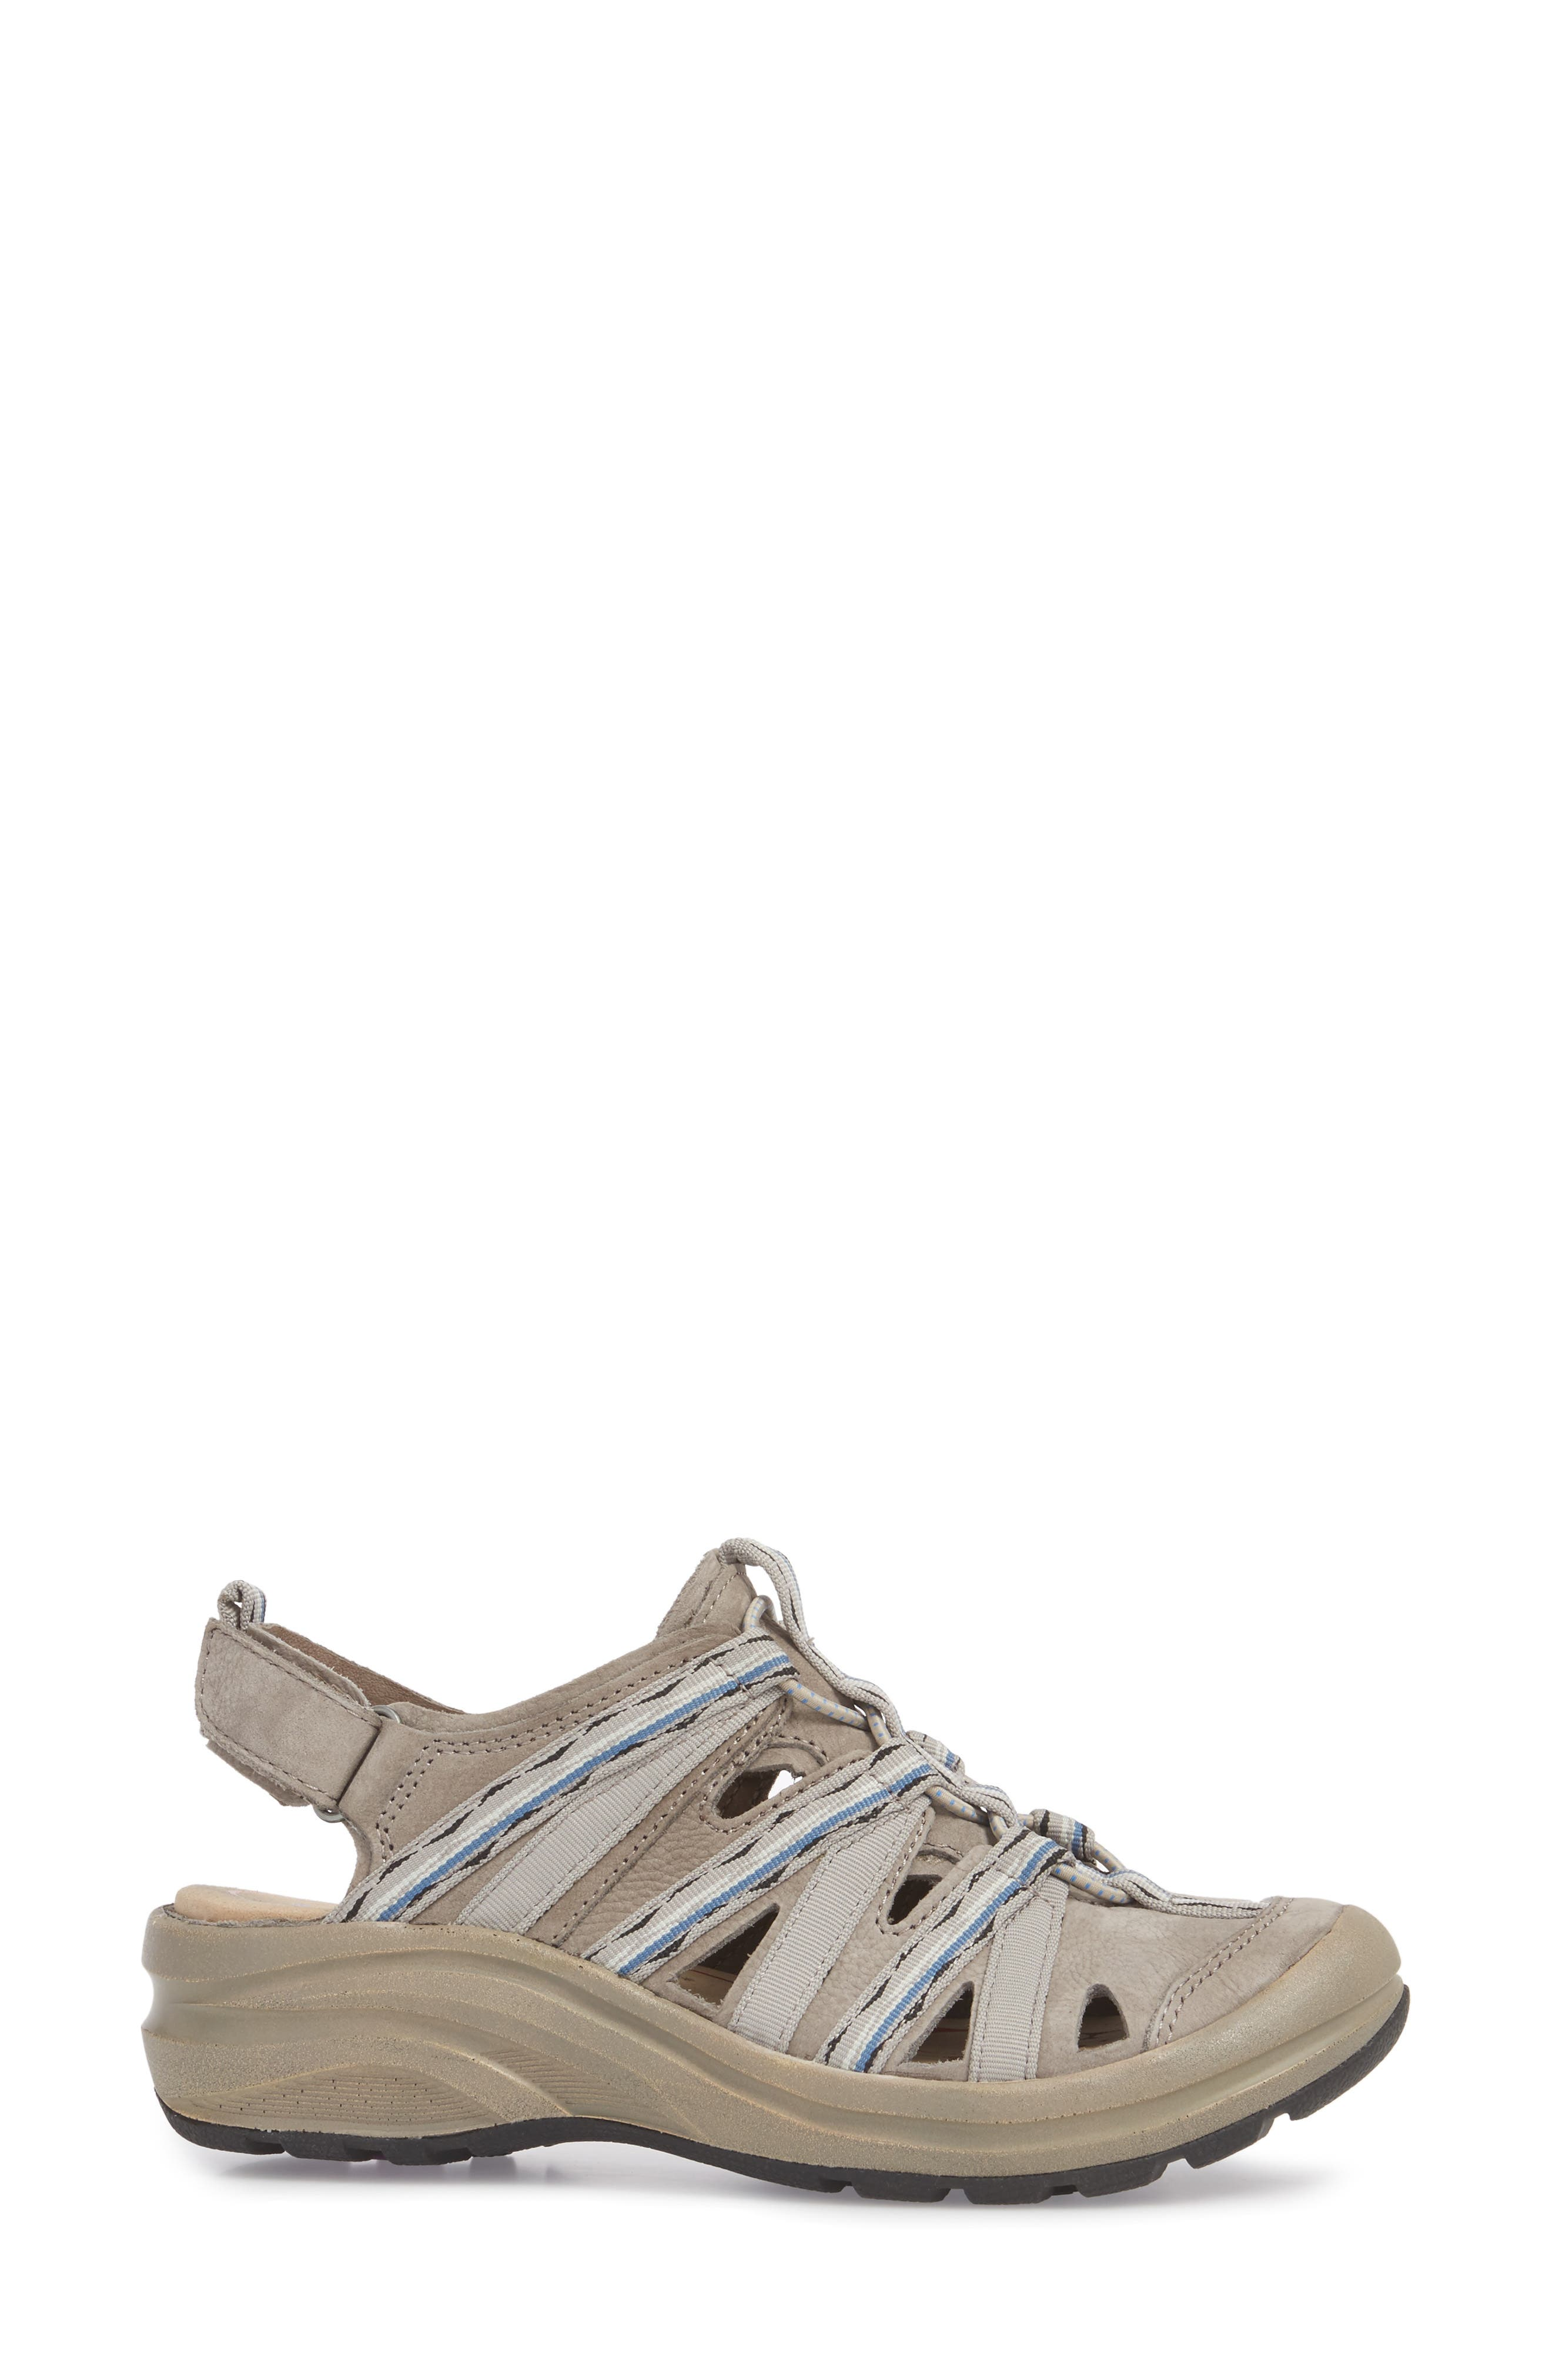 Malabar Sport Sandal,                             Alternate thumbnail 3, color,                             Paper Mache Leather